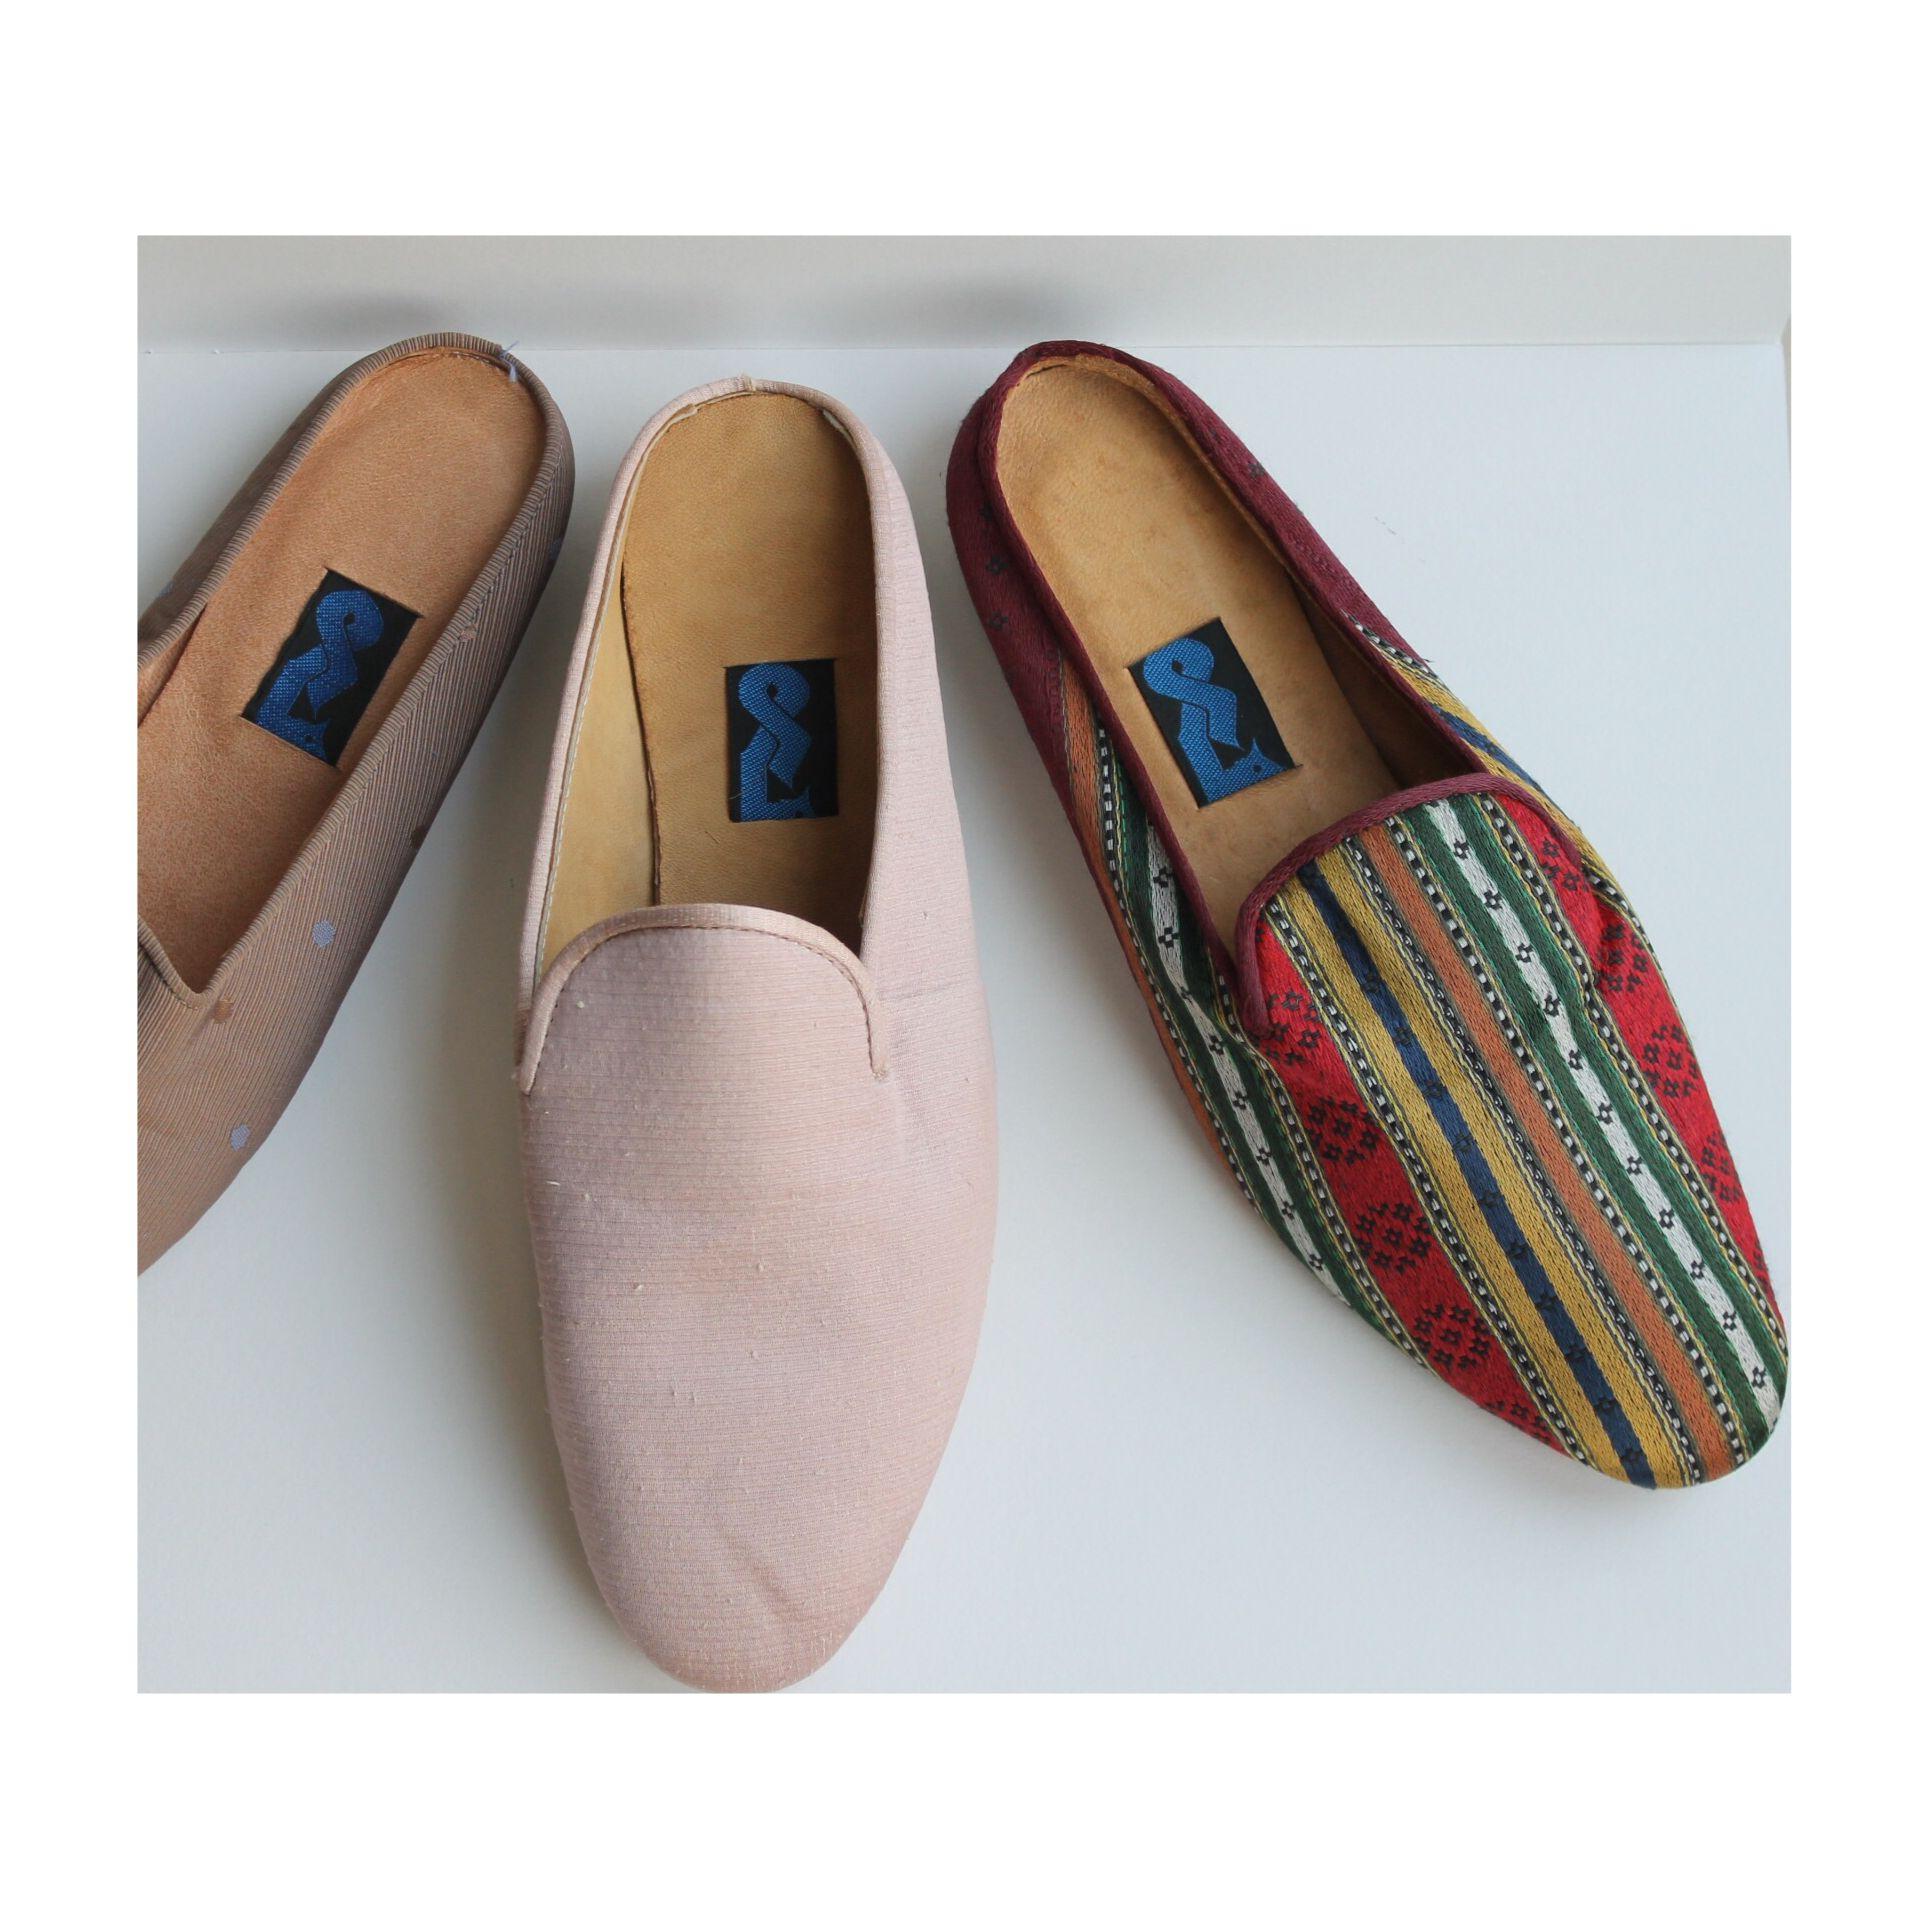 2016 shoes trend Babouche slippers https://instagram.com/p/BL3a8MBDvNv/